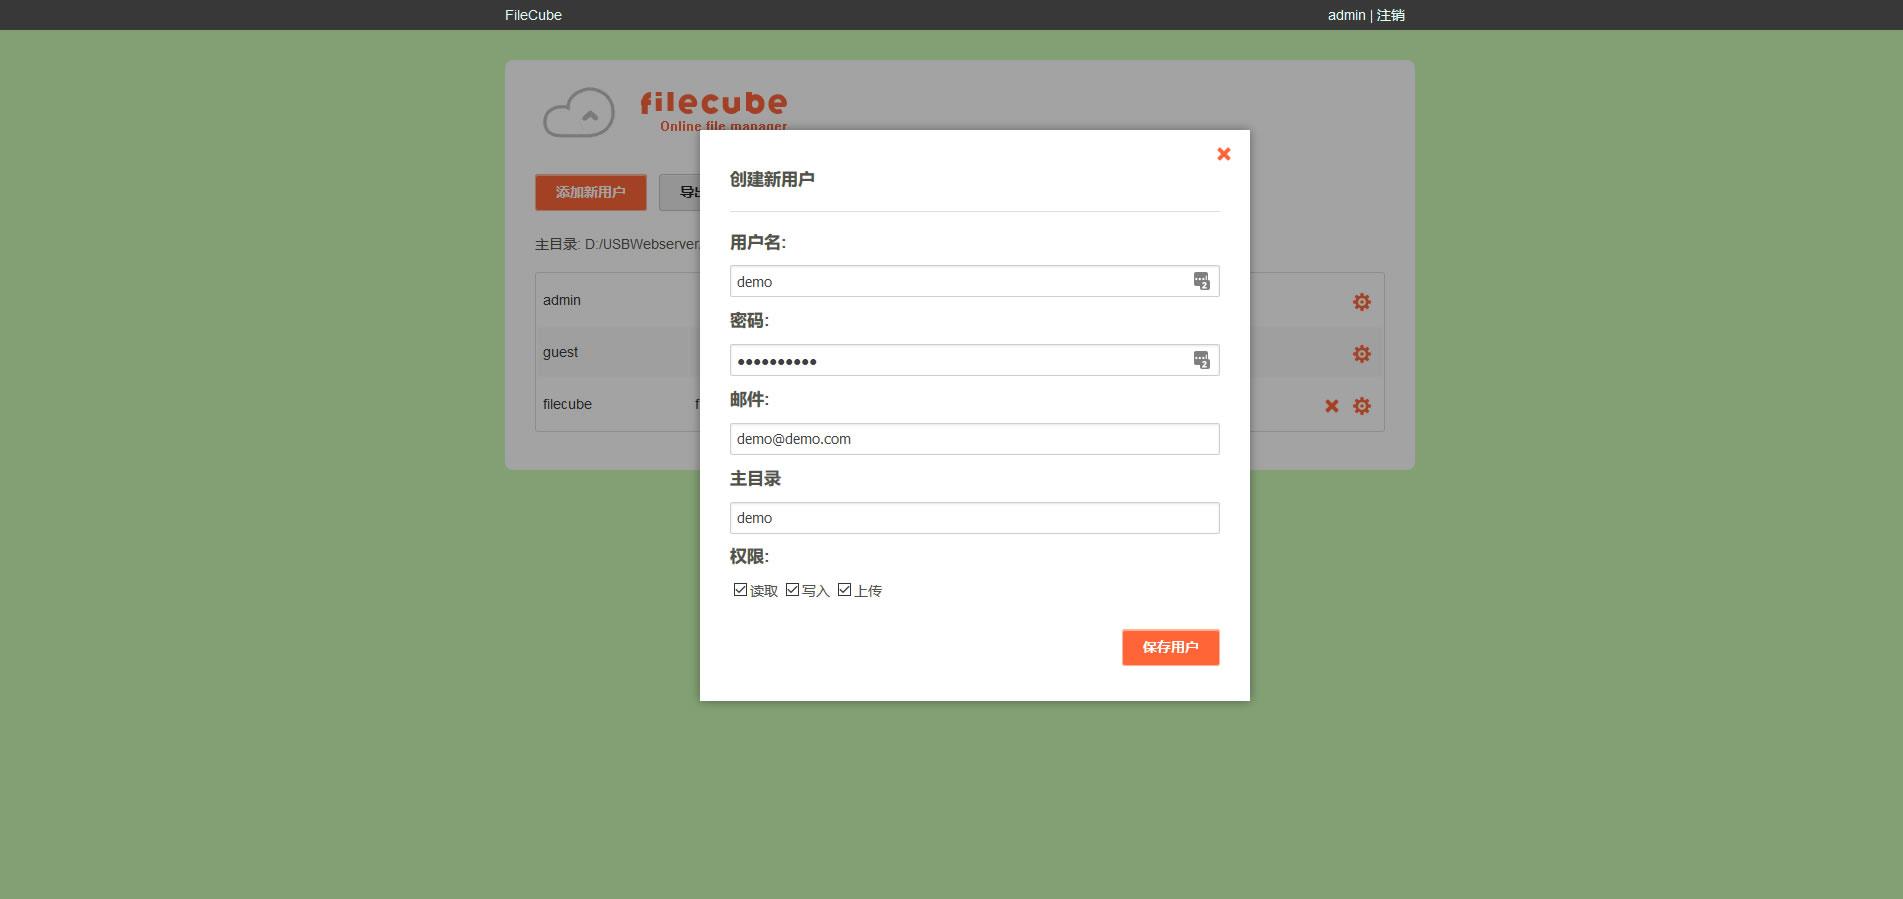 filecube screenshoot 15 - Filecube - 独立便捷PHP在线文件分享与外链管理系统